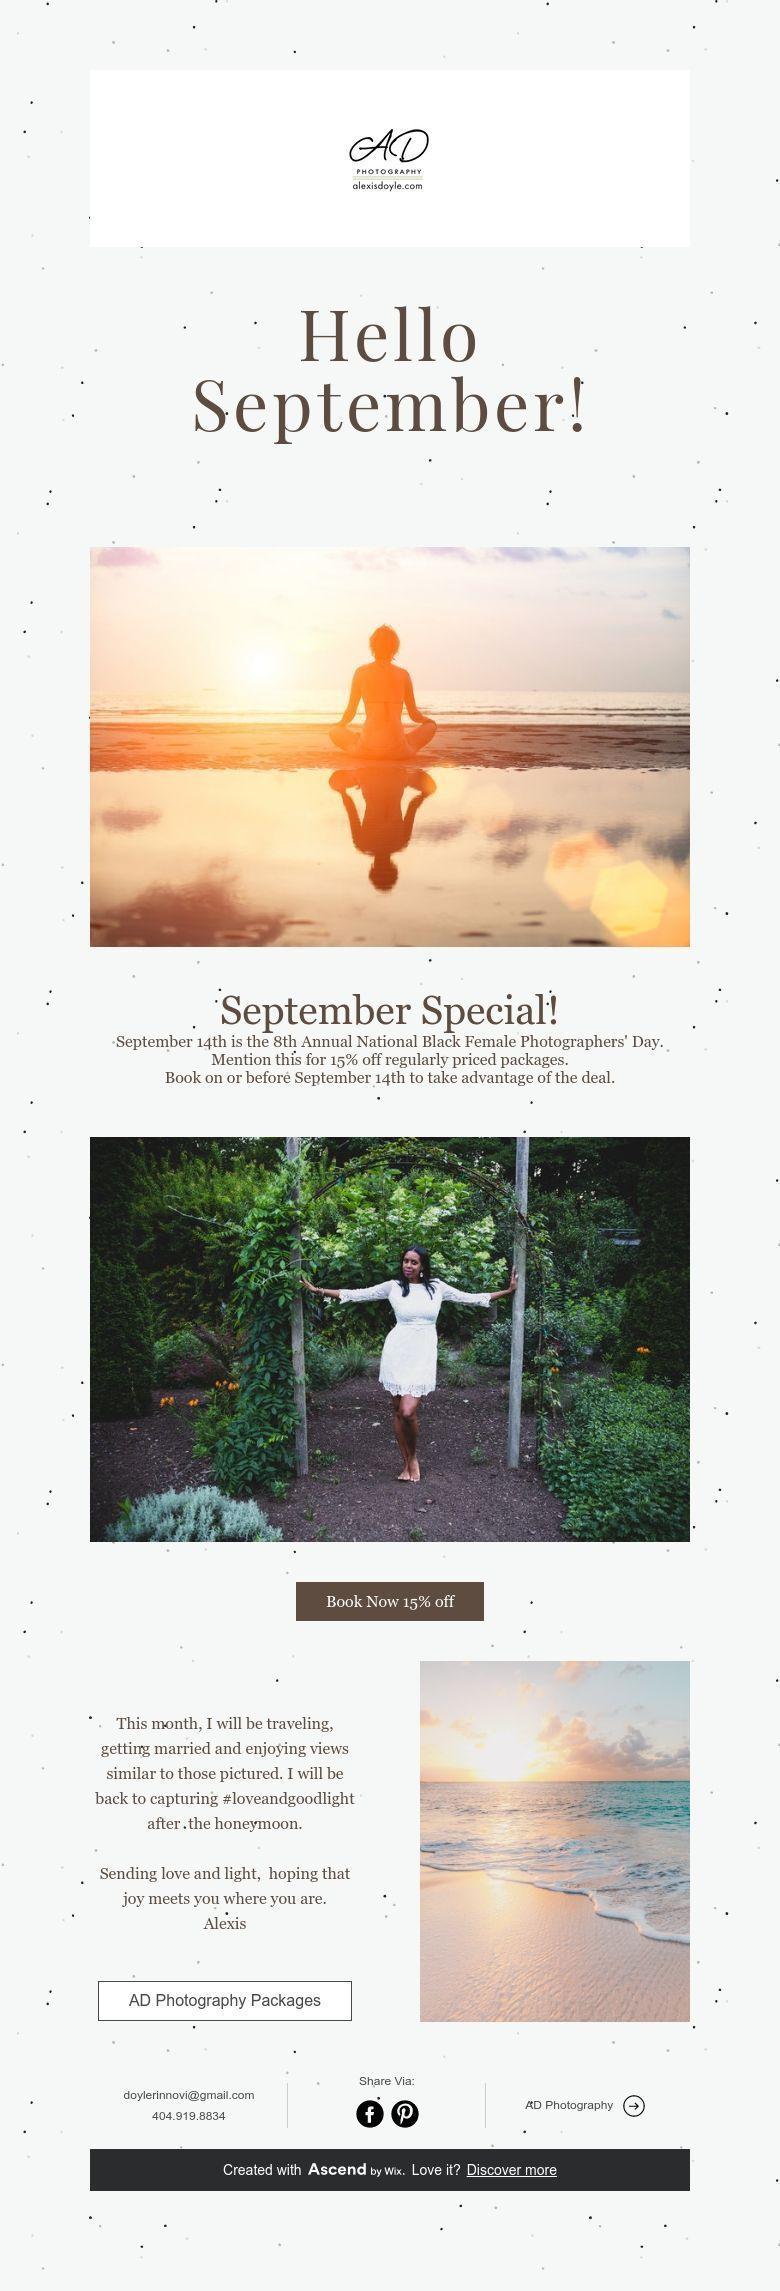 Hello September! #helloseptember Hello September! #helloseptember